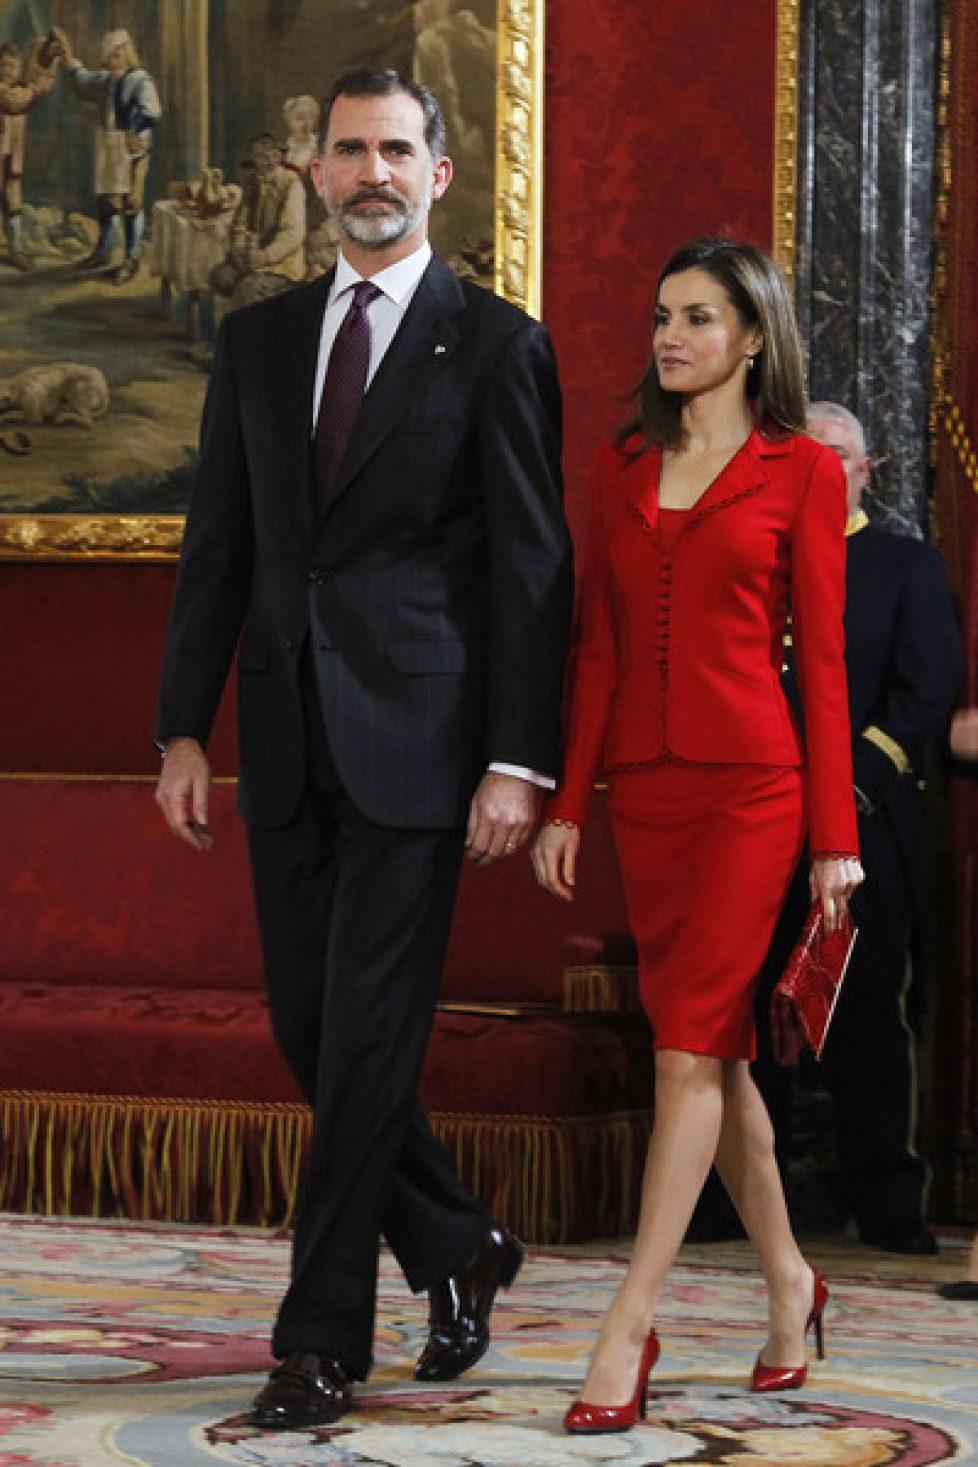 Spanish+Royals+Attend+Commemoration+Cervantes+vdf_ehjo7k9l